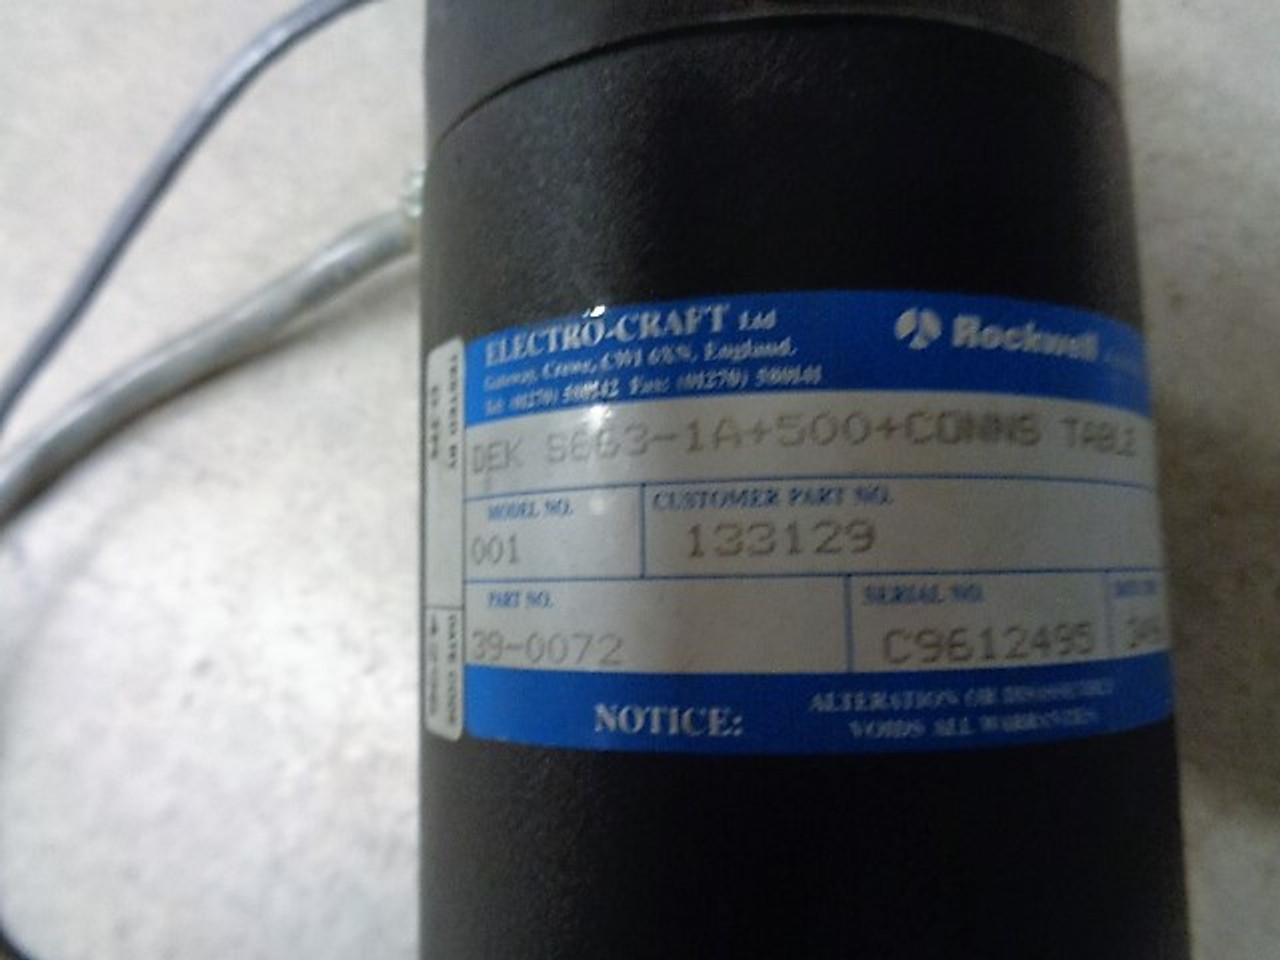 Electro-Craft DEK S663-1A DEK, Electro-craft, Rockwell Automation DEK  S663-1A+500+CONNS TABLE Motor, Customer Part# 133129